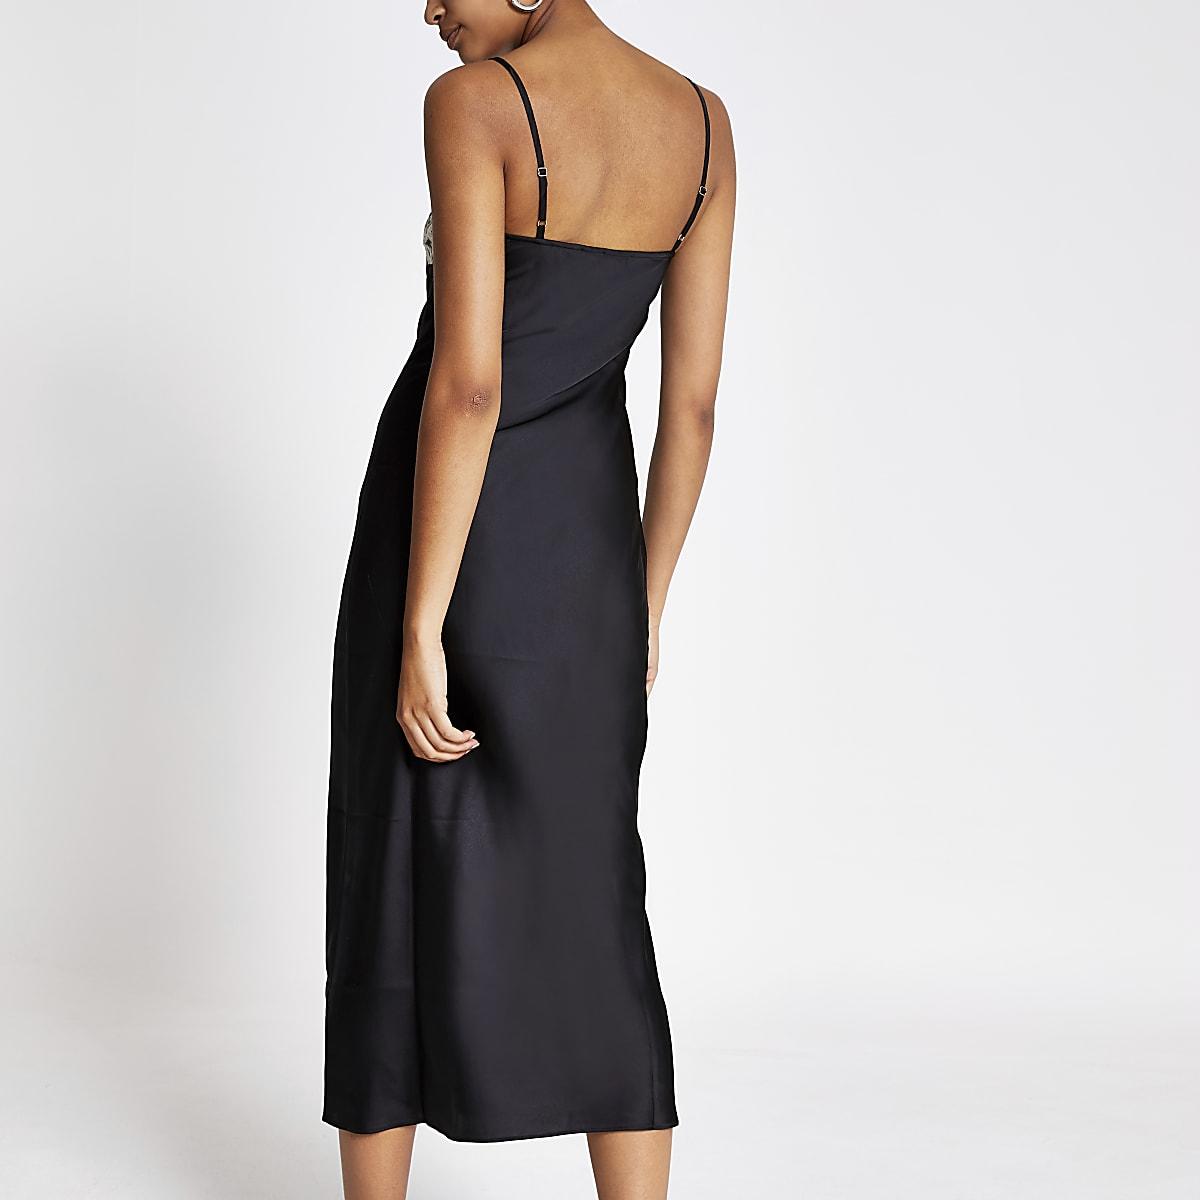 7d1cd7408 Black lace trim satin slip dress